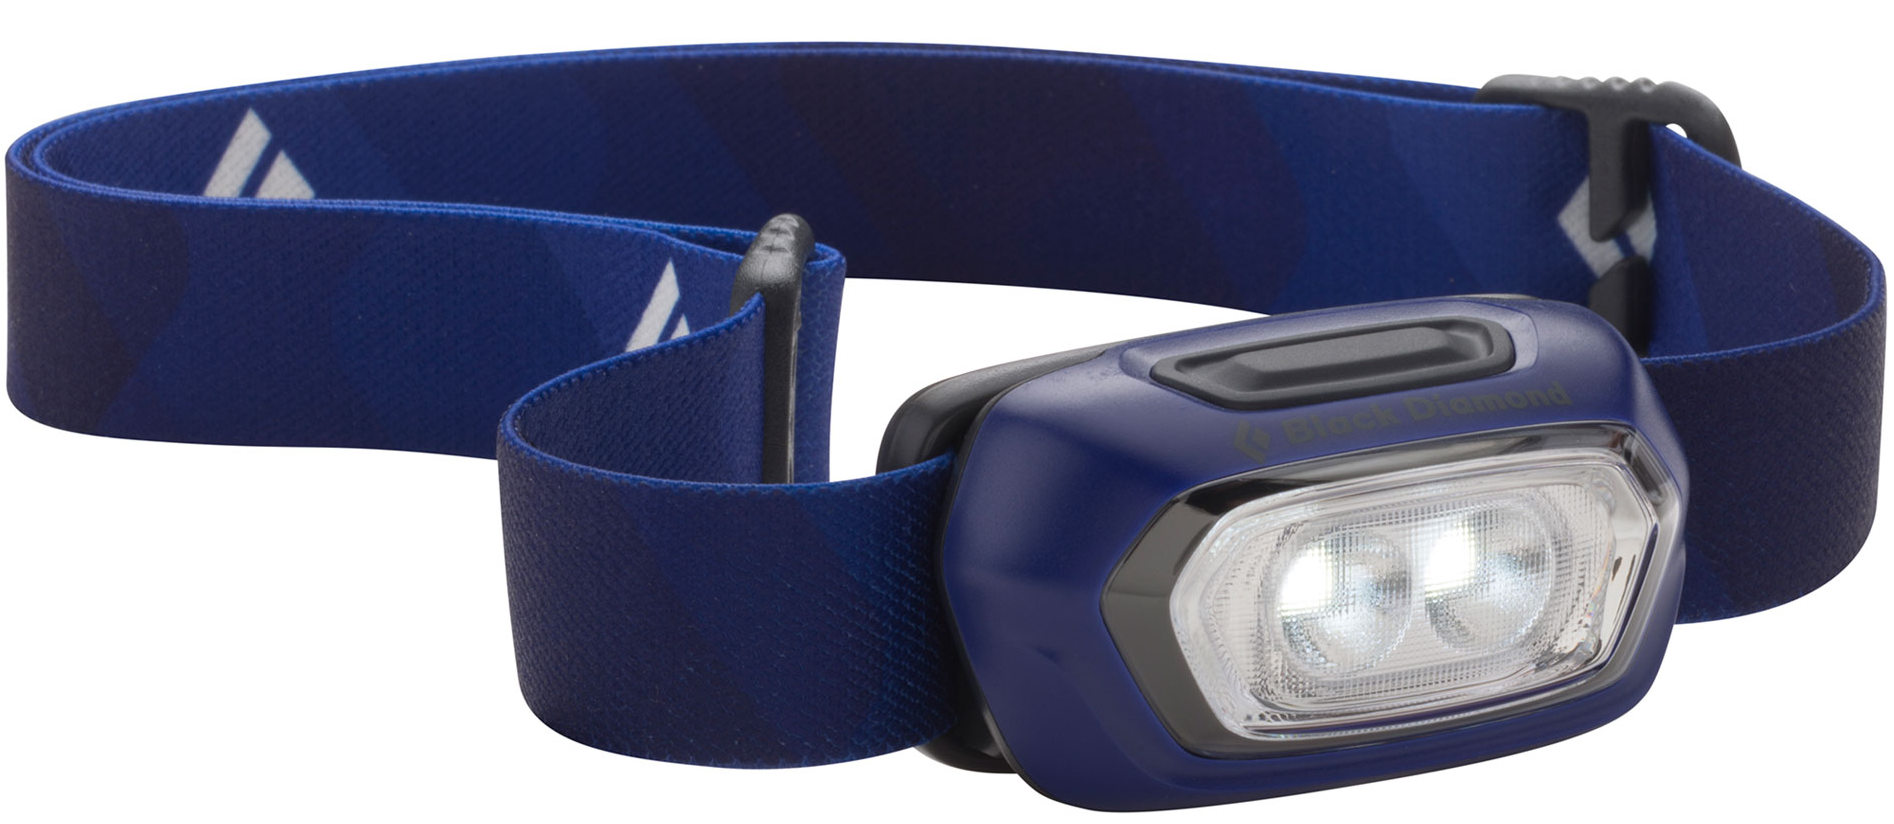 Black Diamond 頭燈/led頭燈/背包客/健行/玉山/嘉明湖 Gizmo 防水LED頭燈 BD620619 藍